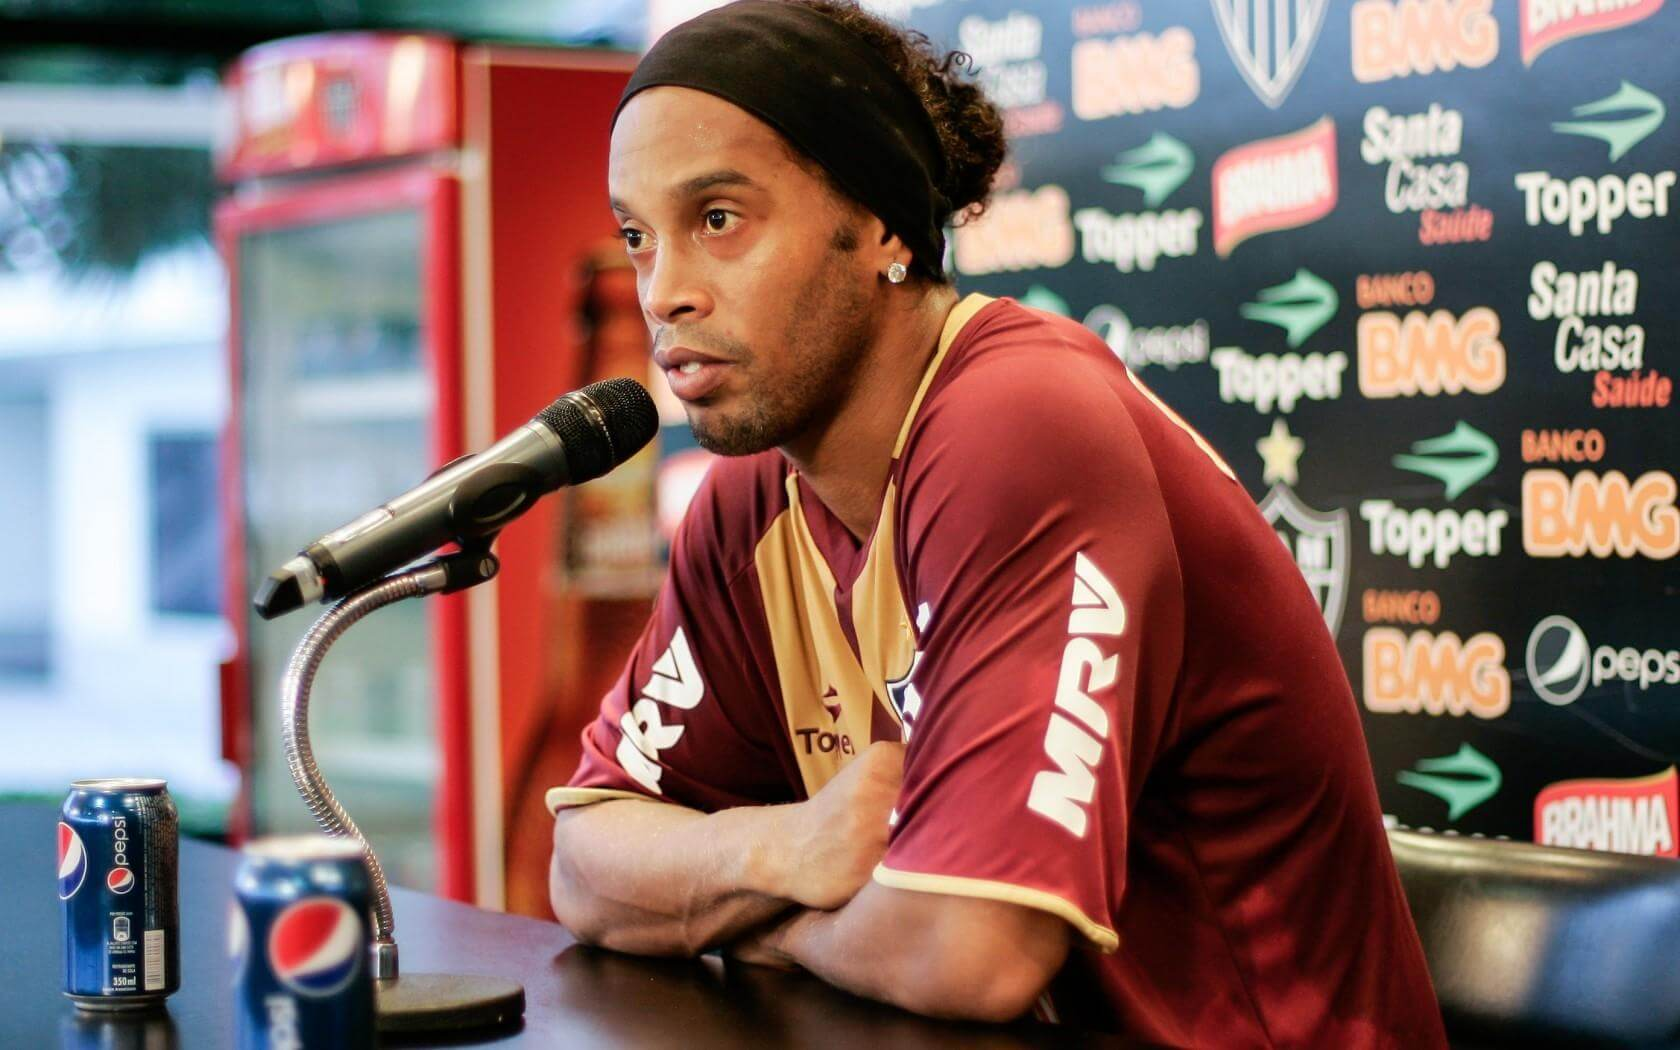 Ronaldinho with Coca cola